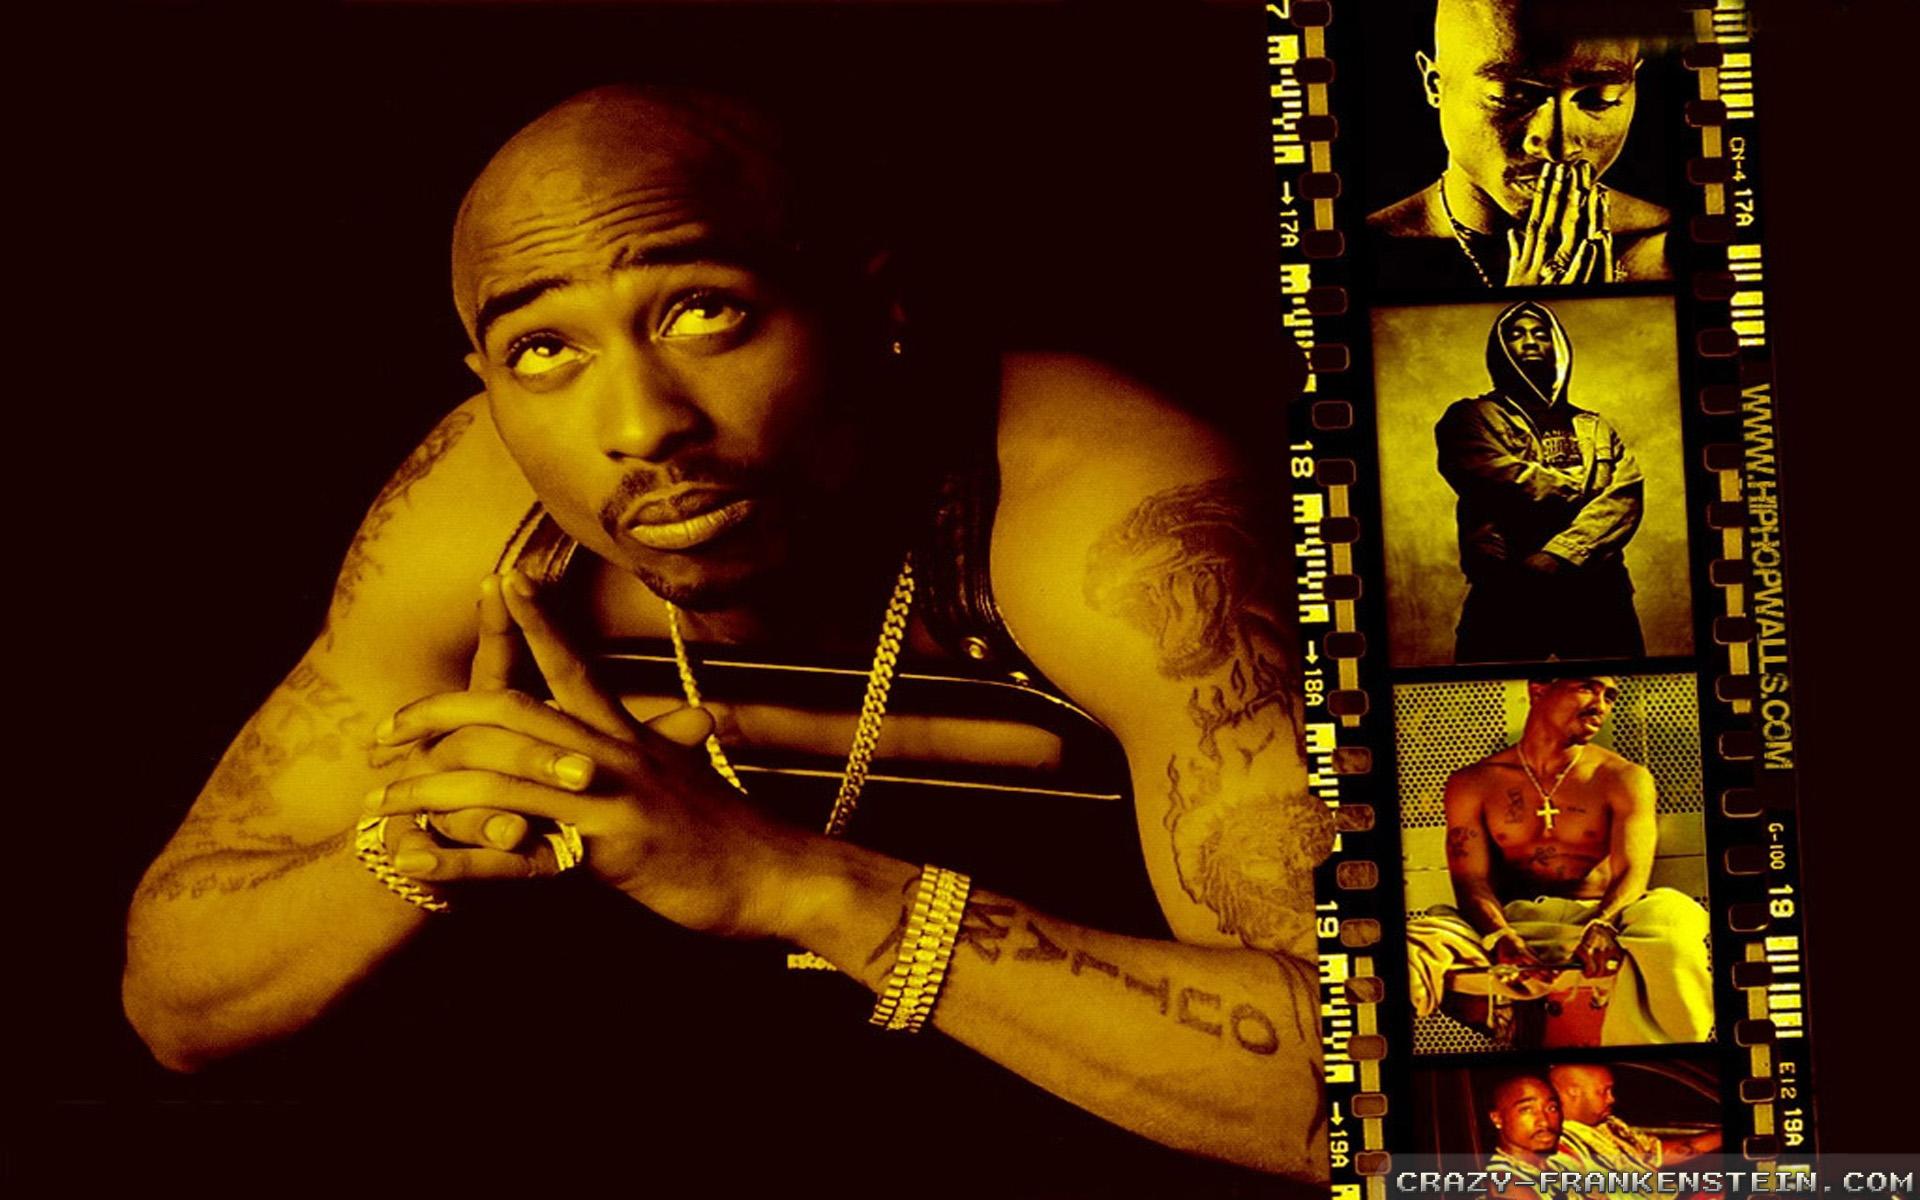 TUPAC gangsta rapper rap hip hop te wallpaper 1920x1200 181026 1920x1200